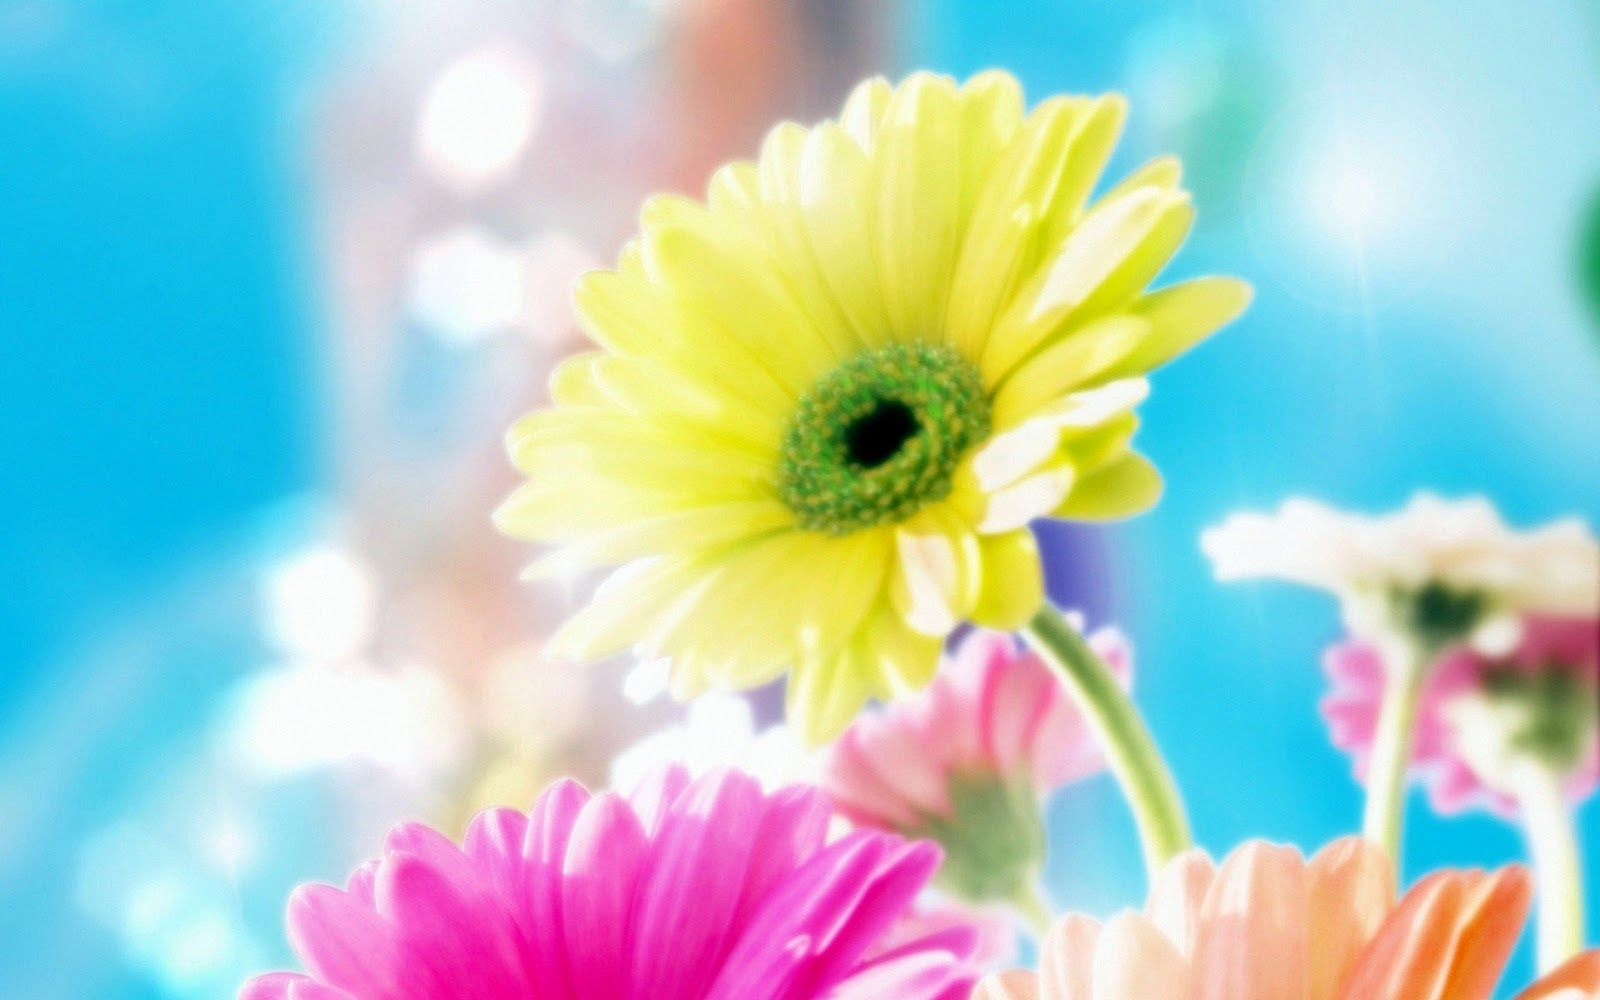 Beautiful Flowers Download Best Hd Wallpapers Most Beautiful Flower Wallpaper In 2020 Beautiful Flowers Wallpapers Flower Wallpaper Most Beautiful Wallpaper